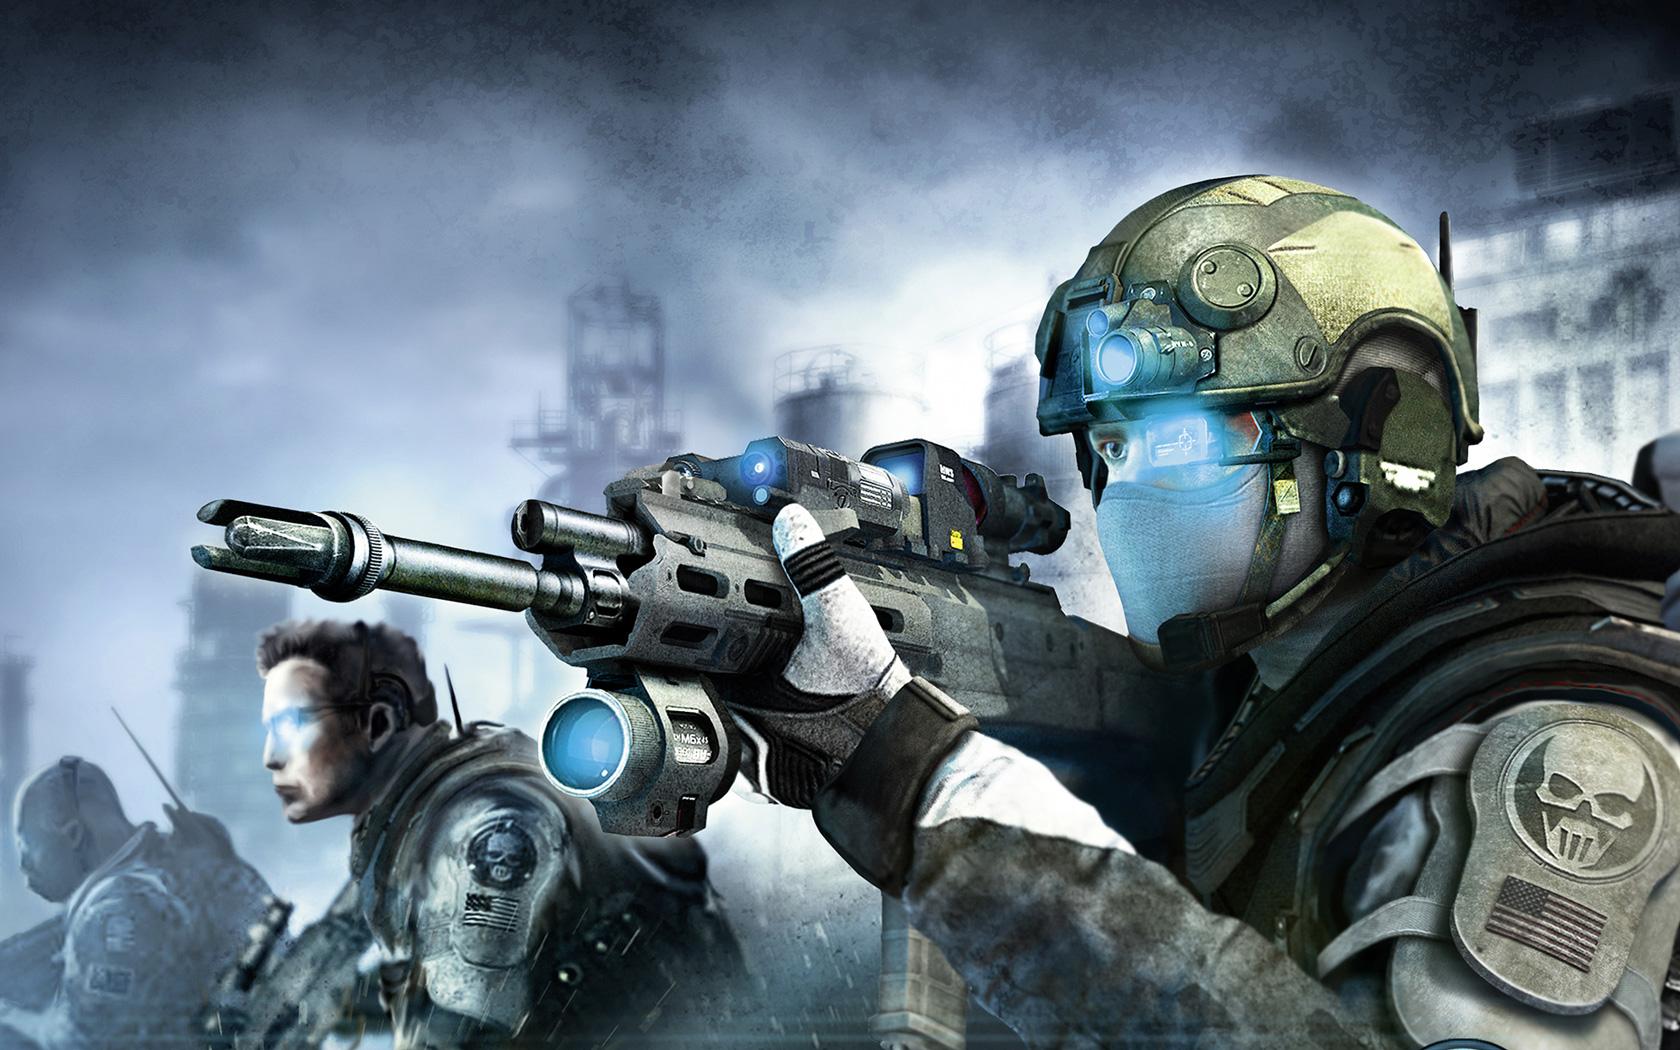 Ghost Recon: Future Soldier Wallpaper in 1680x1050